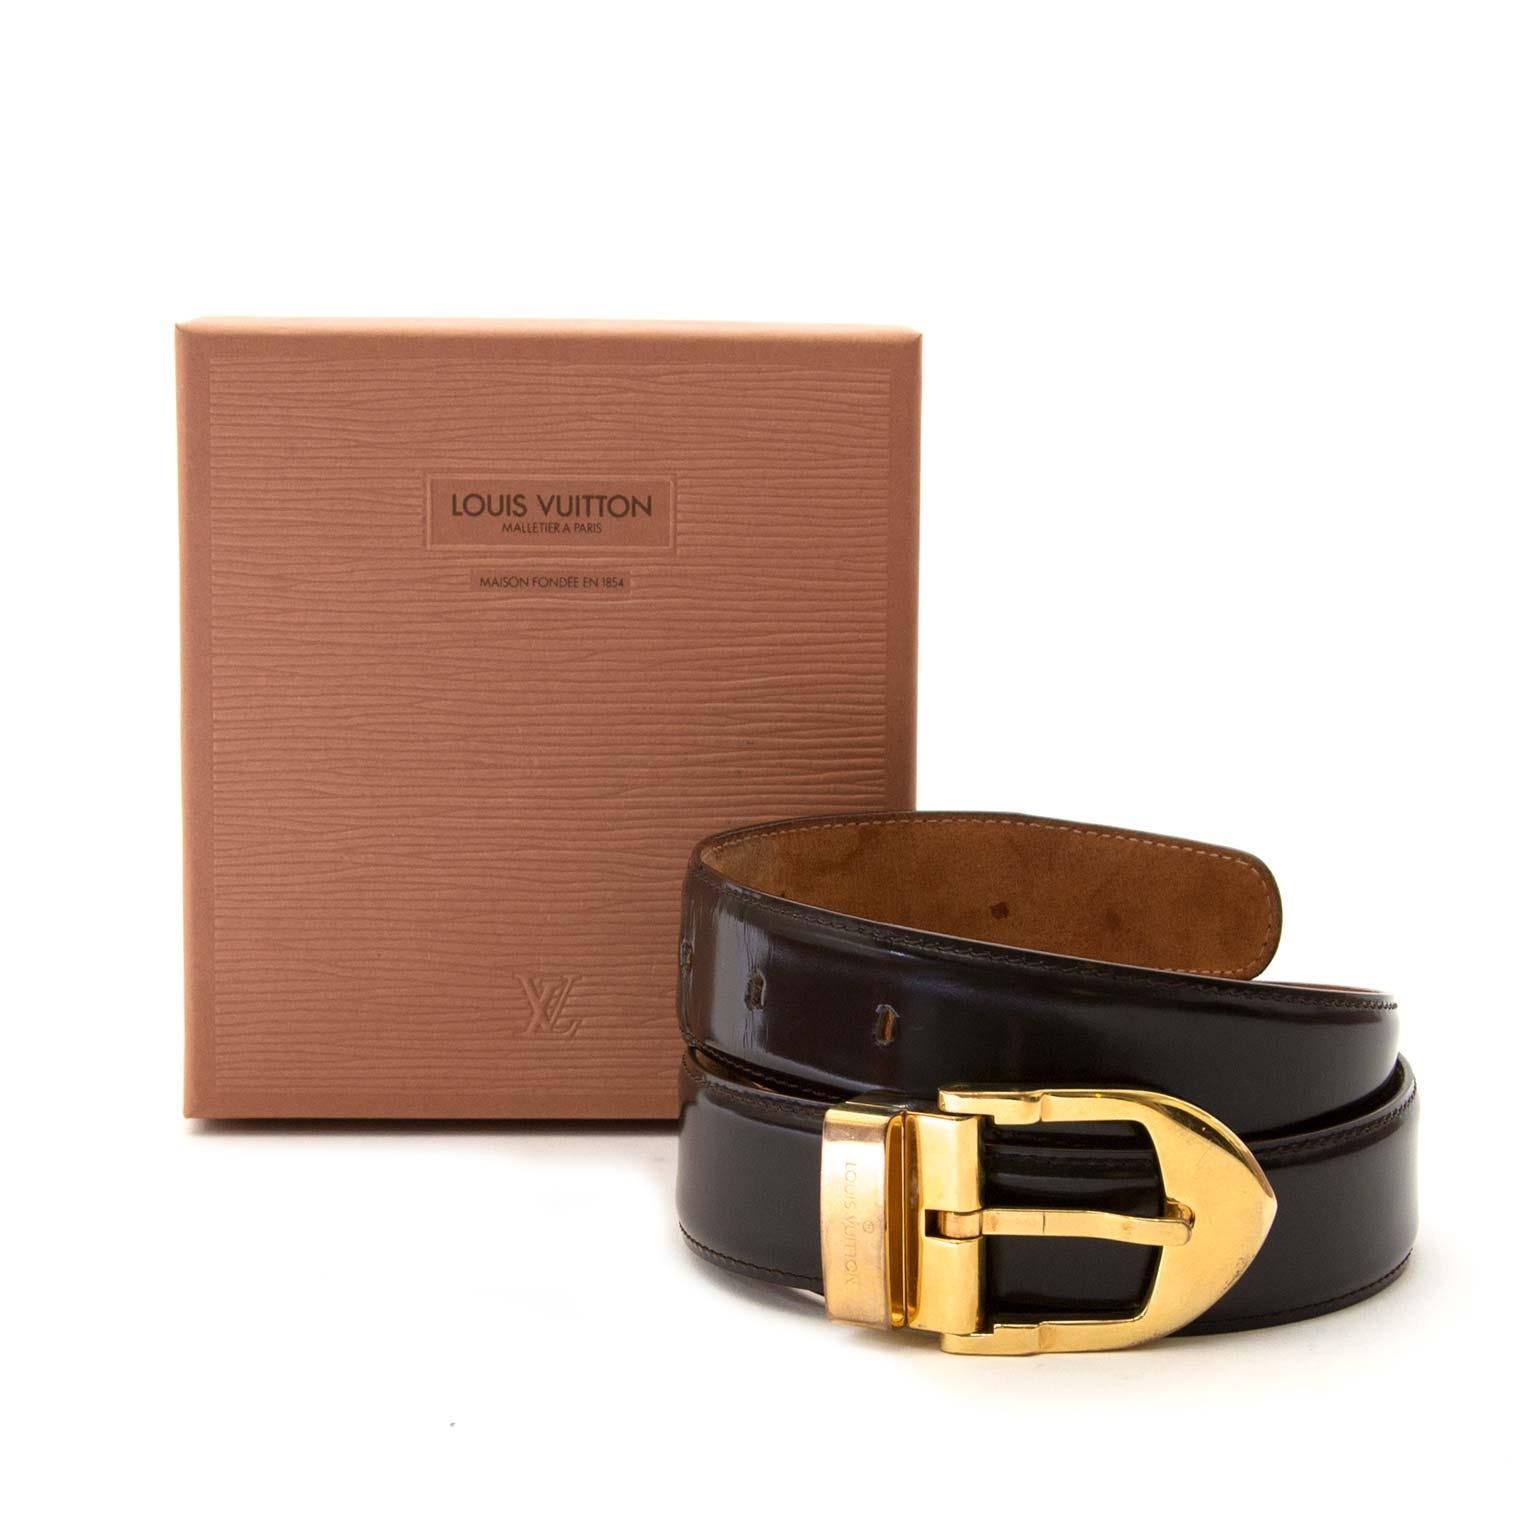 louis vuitton brown patent gold buckle belt now for sale at labellov vintage fashion webshop belgium